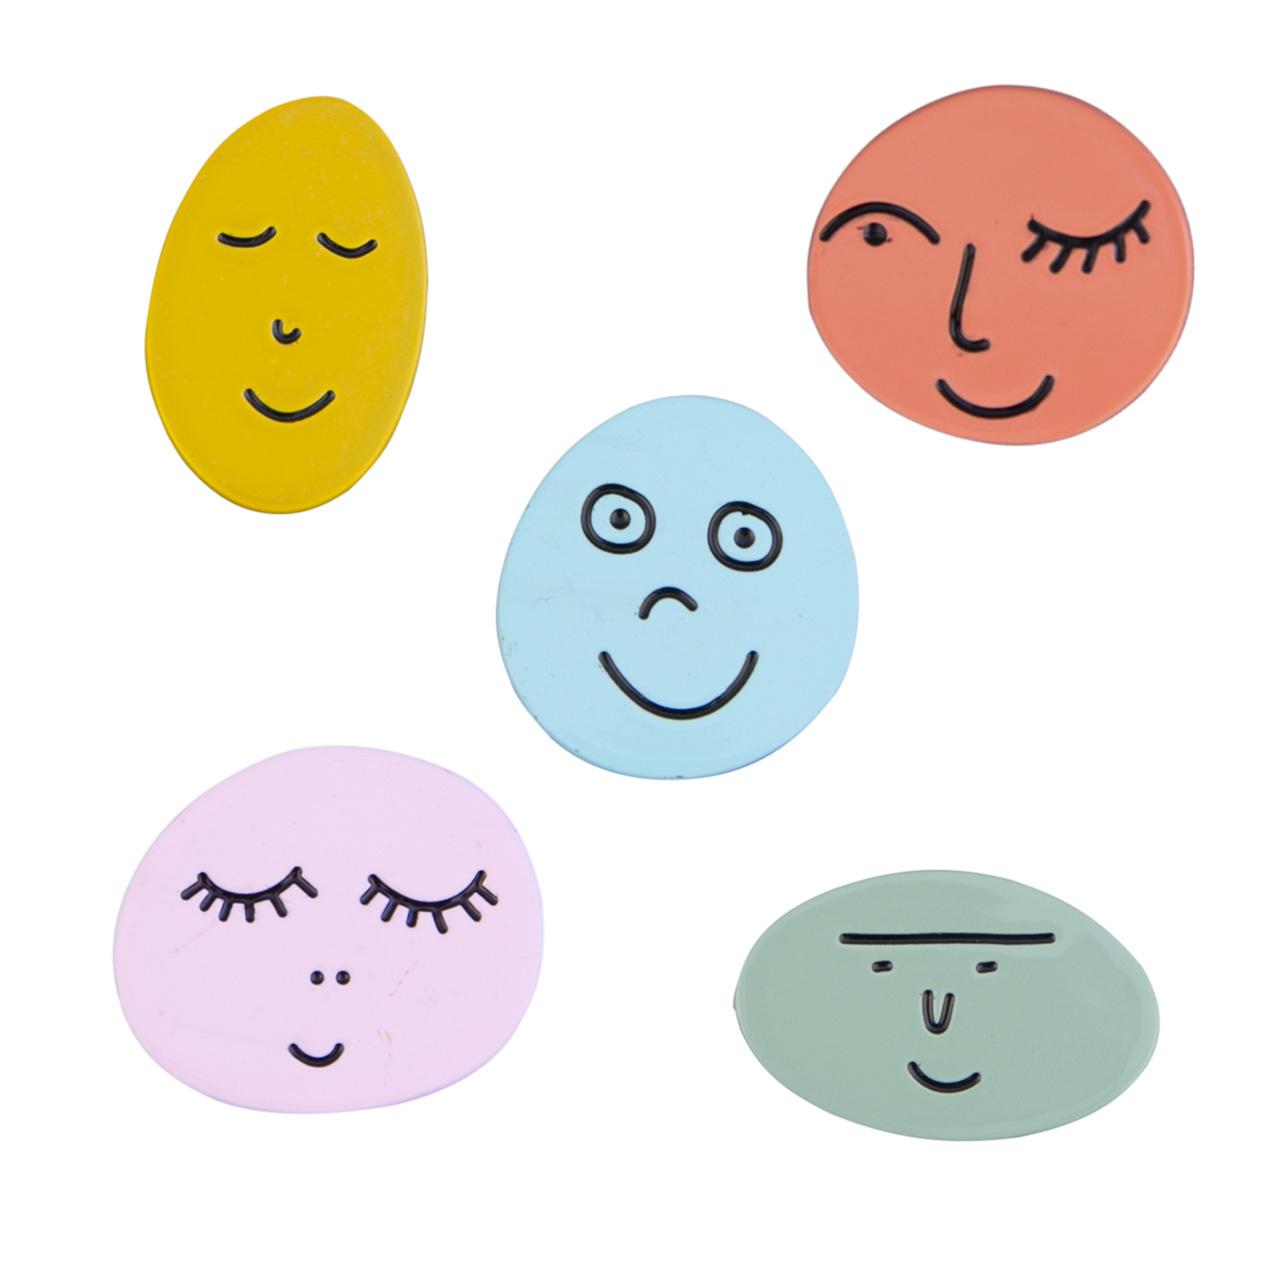 Pins-Faces-Assorted zum Verkauf pro Stück